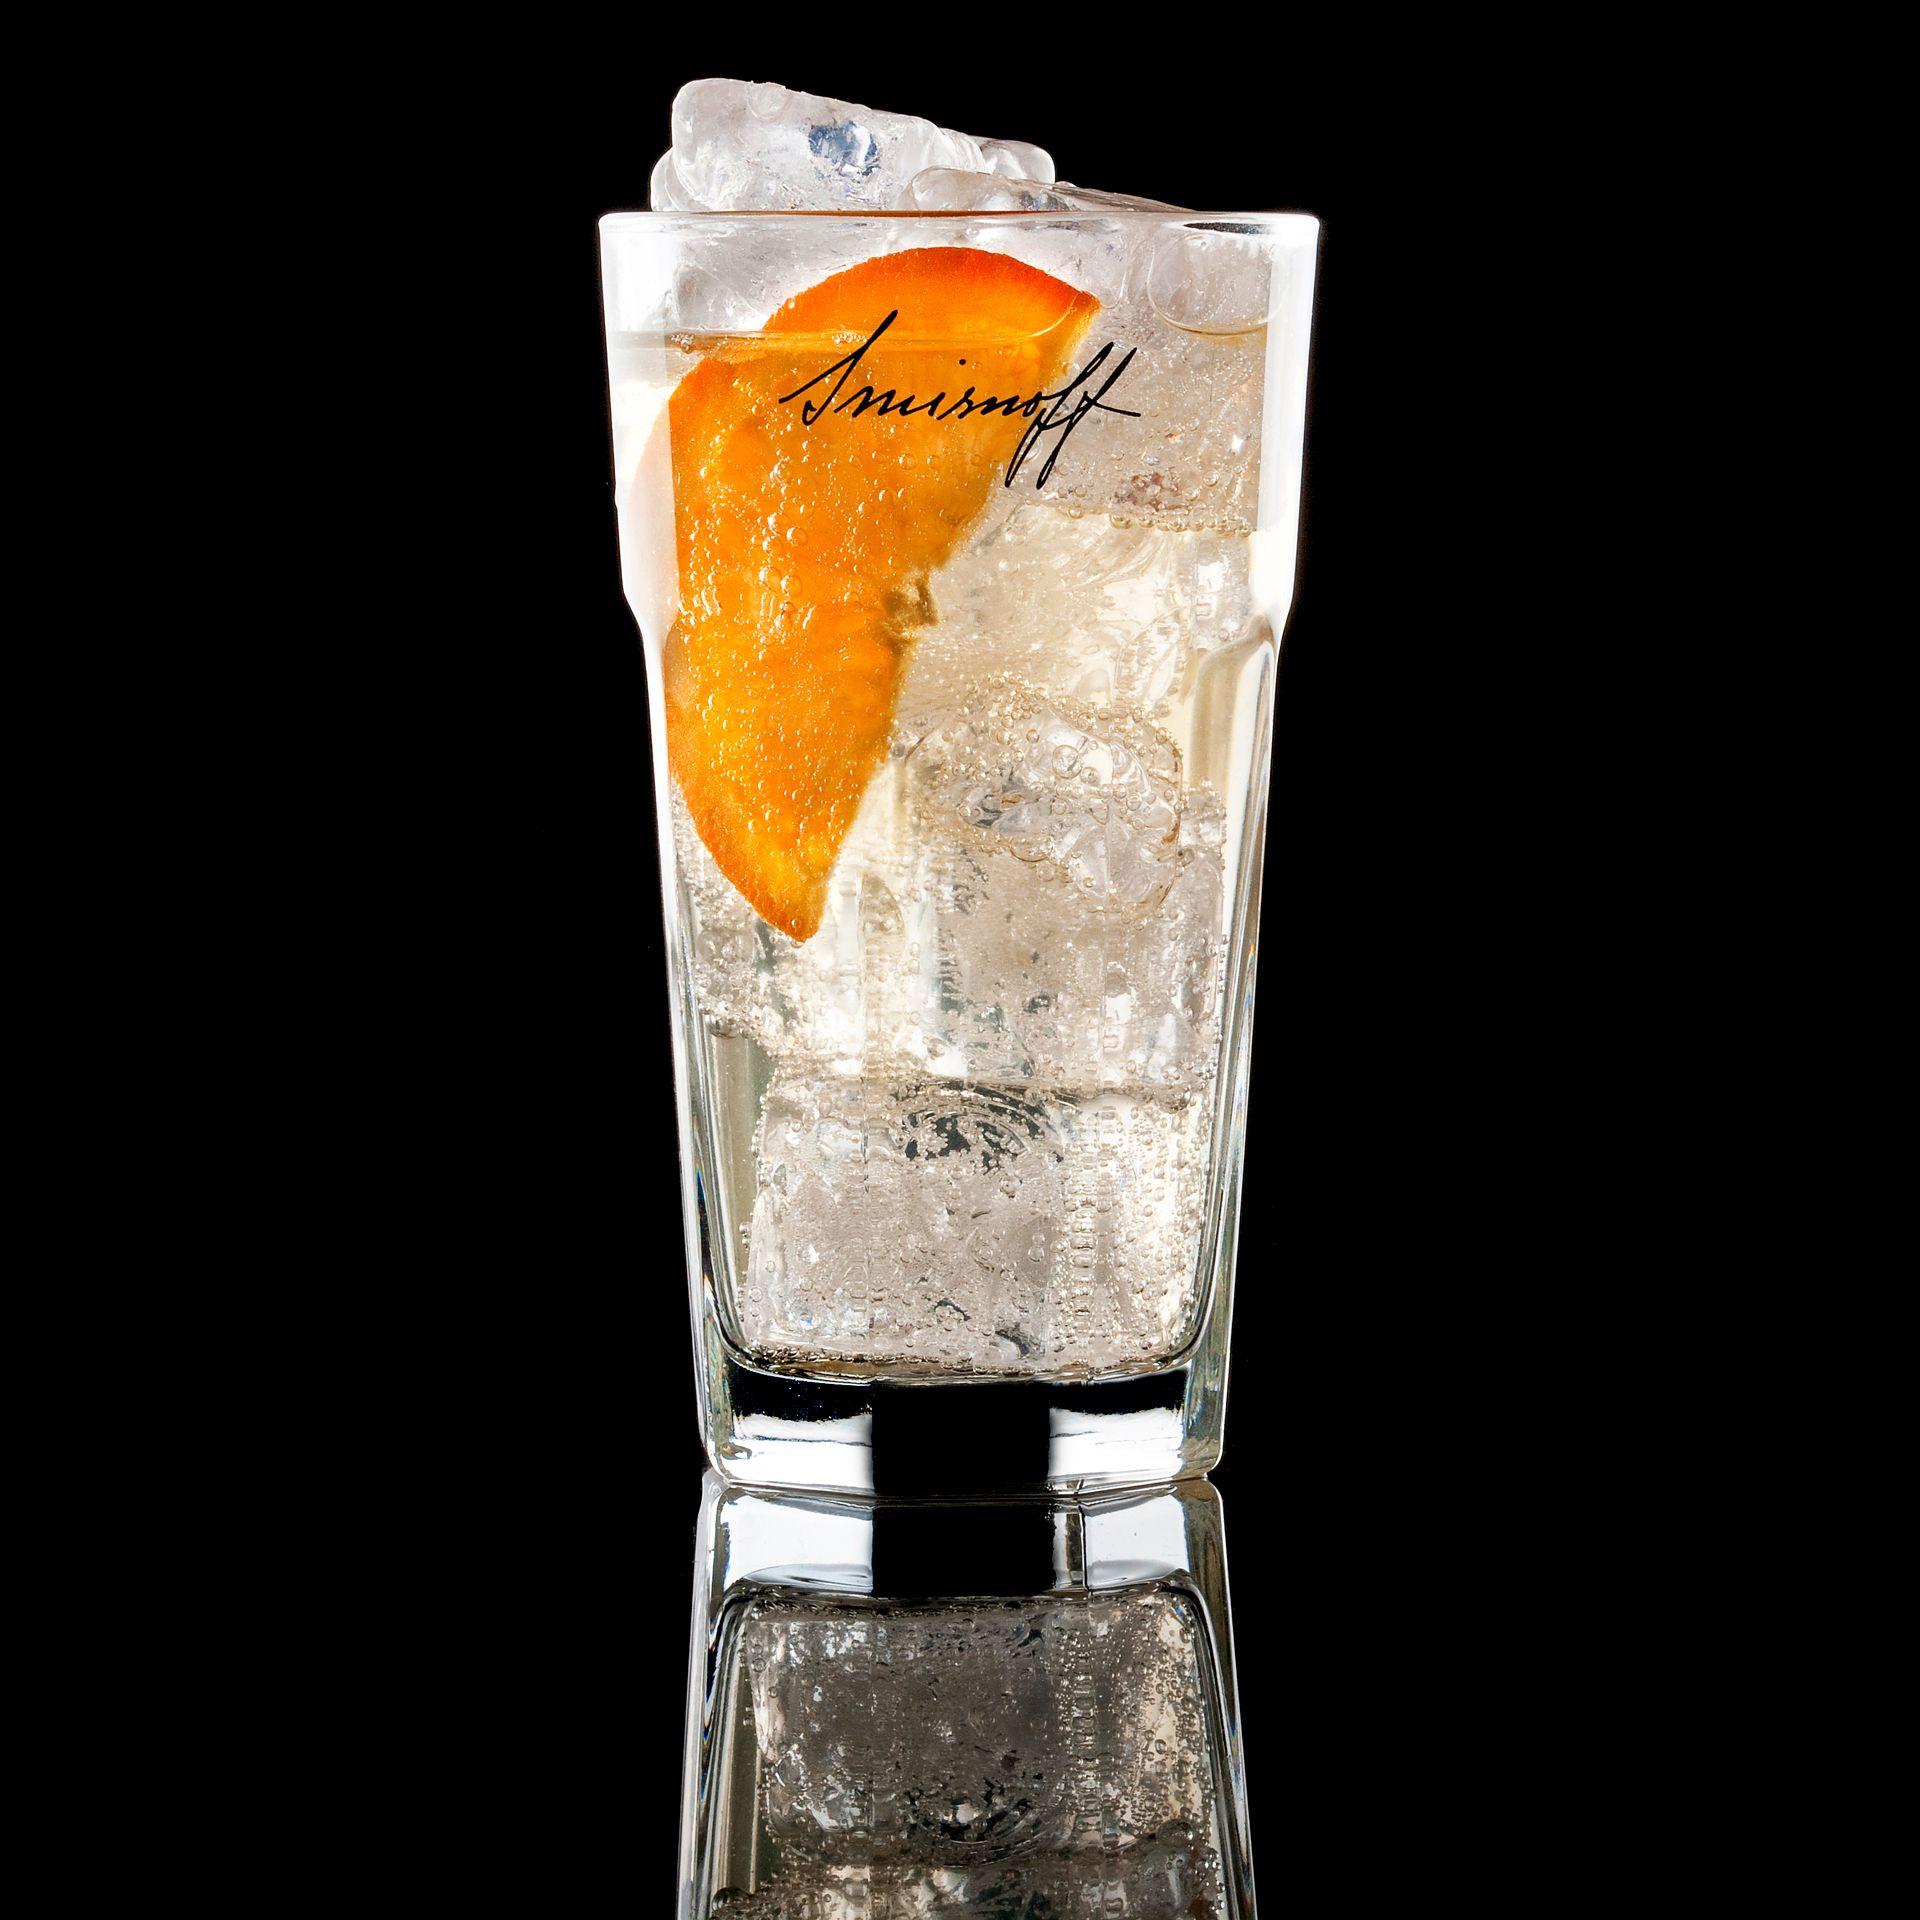 Fotografo Beverage-Diageo-Moscow-Mule